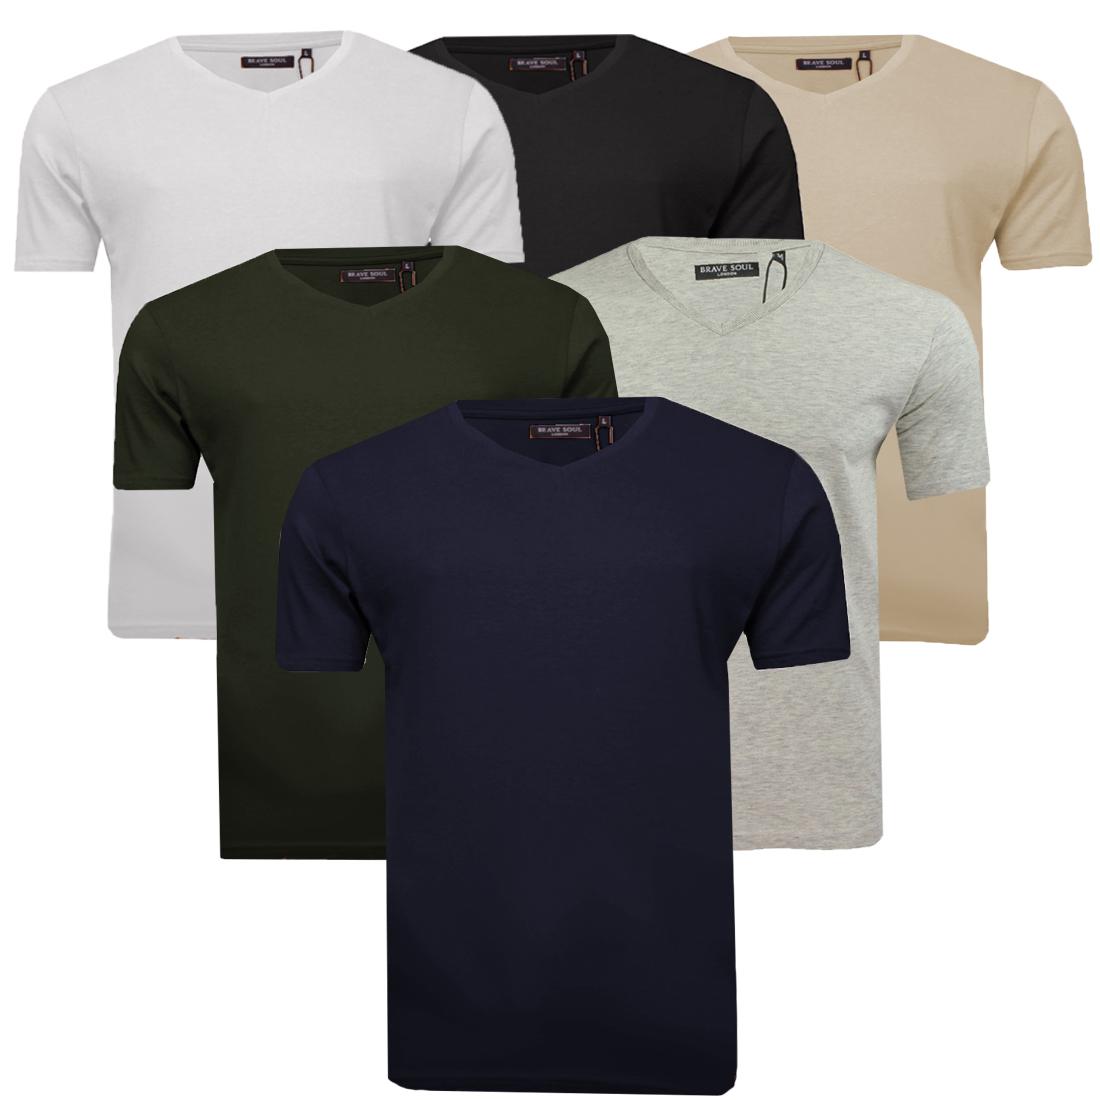 XL Mens V-Neck Cotton T-Shirt by Designer Brave Soul Short Sleeve New Sizes S